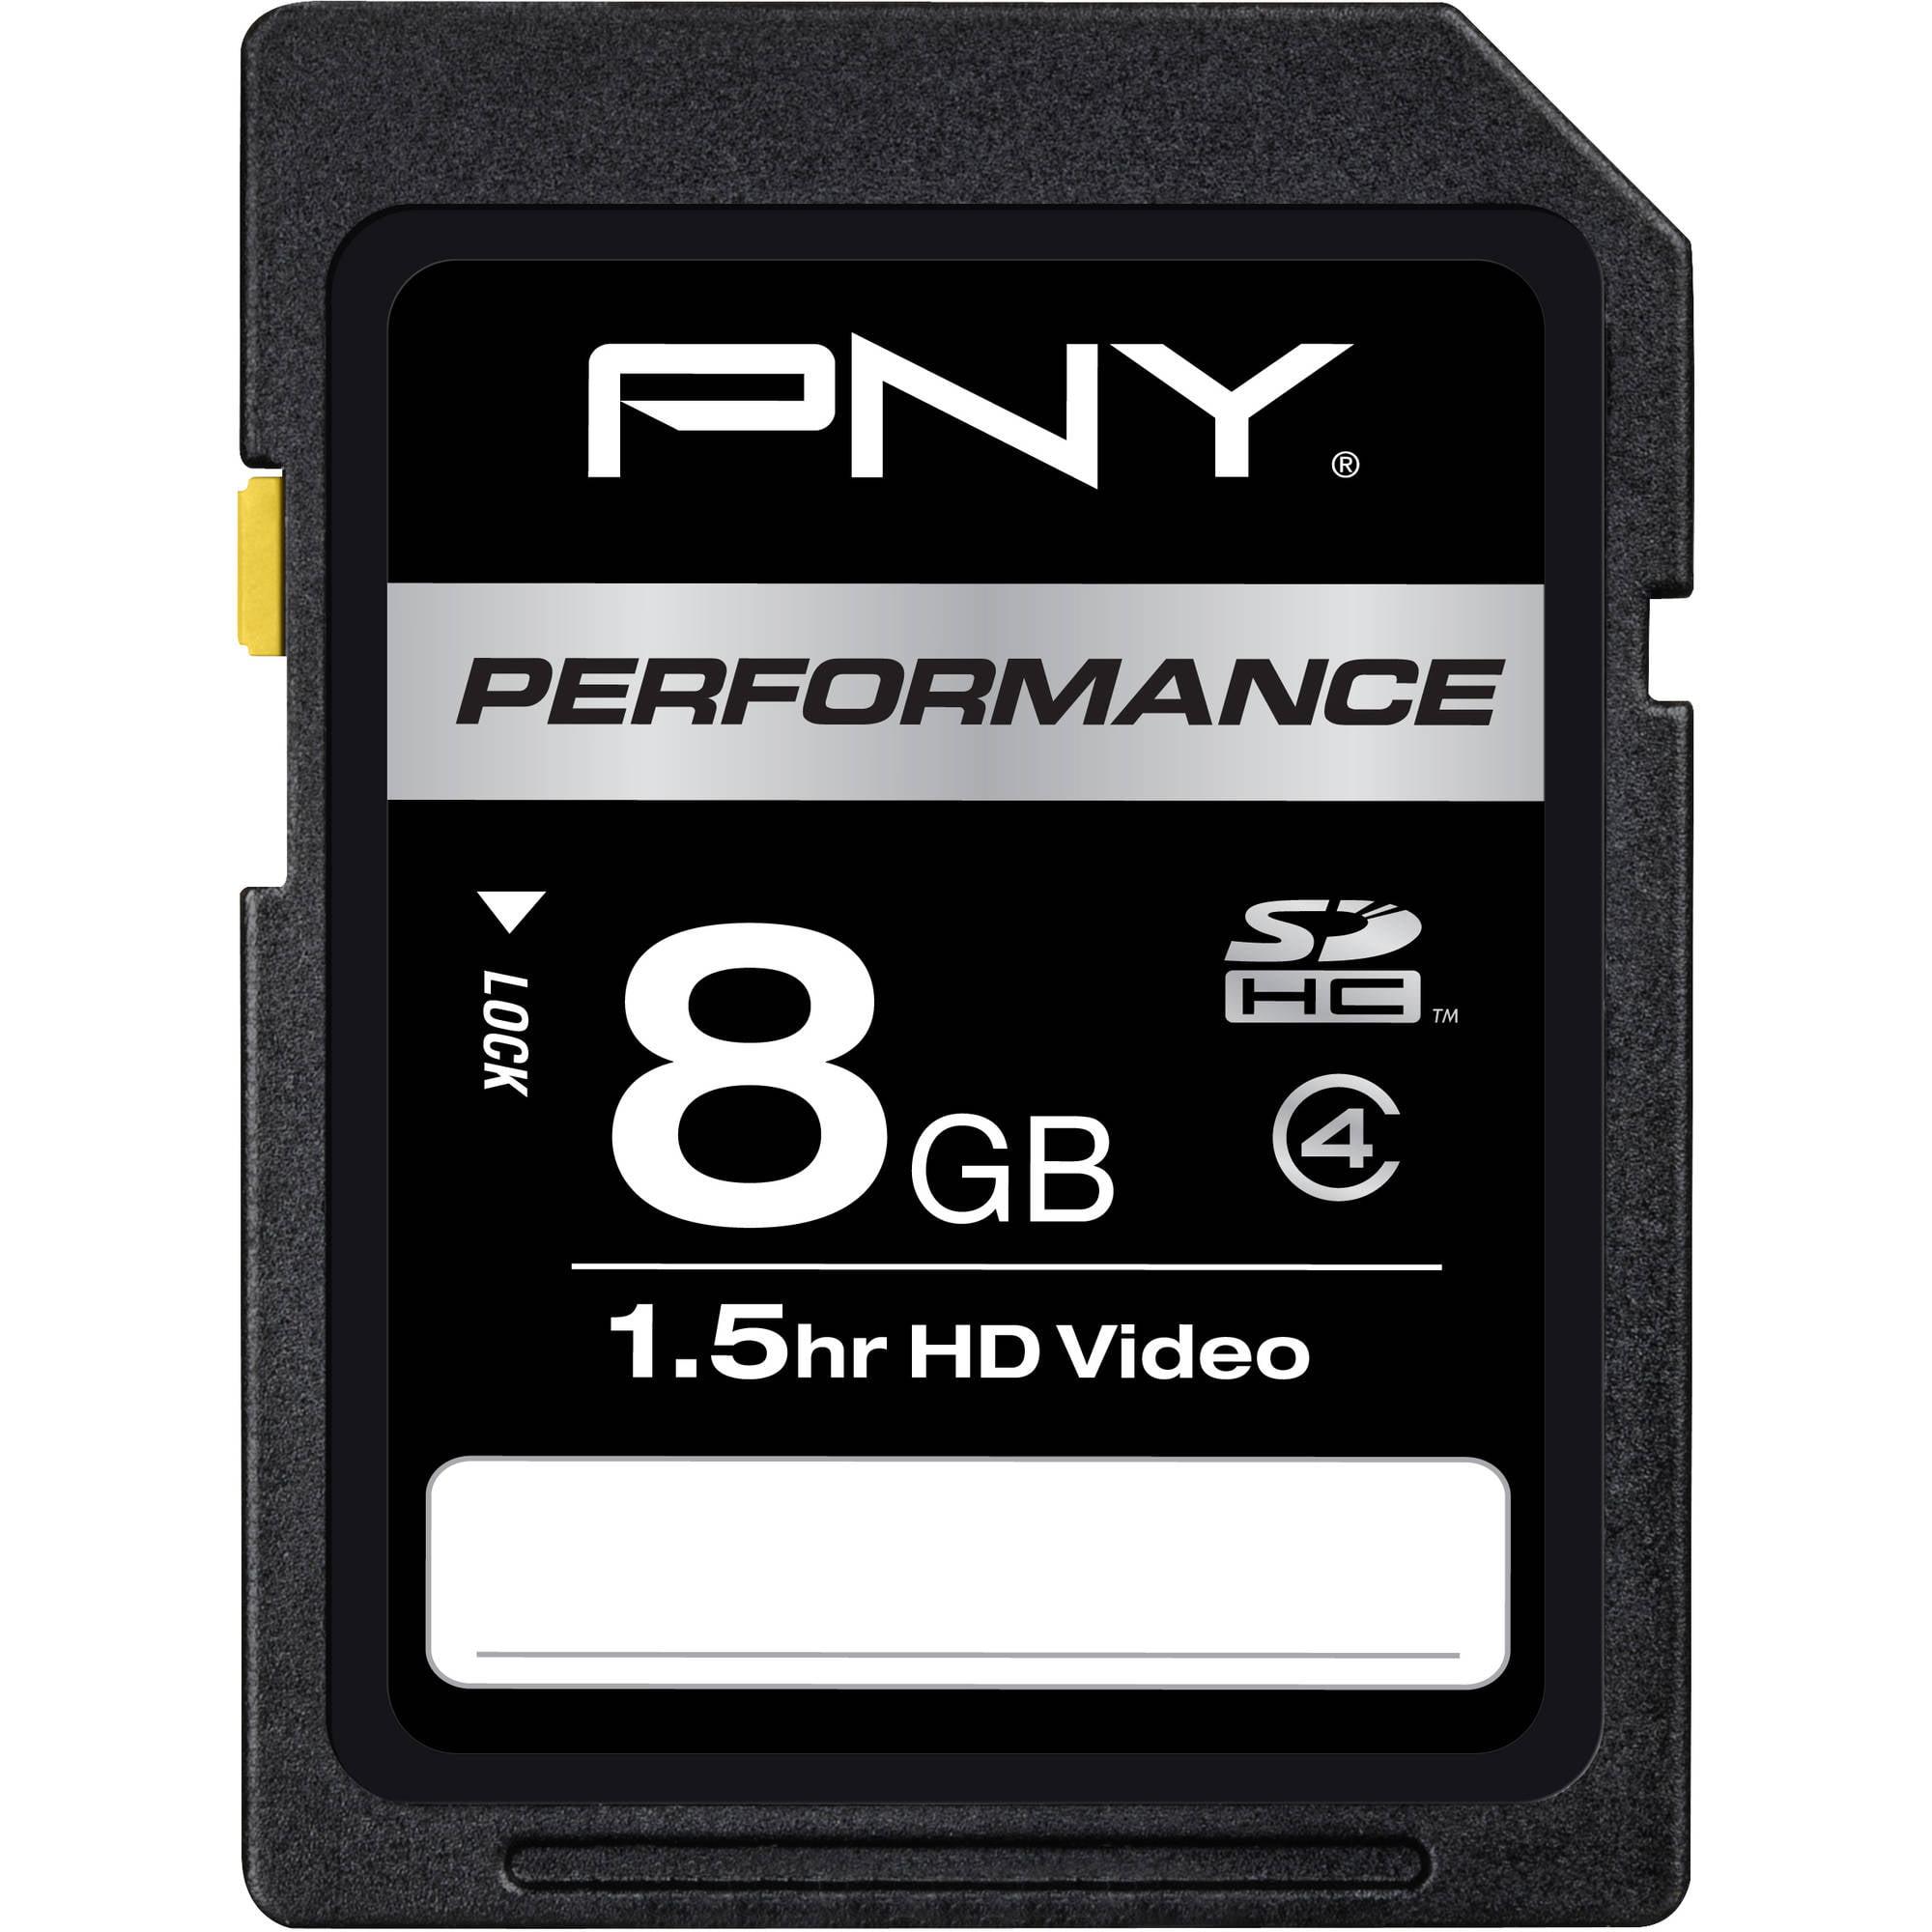 PNY 8GB SDHC Memory Card, Class 4